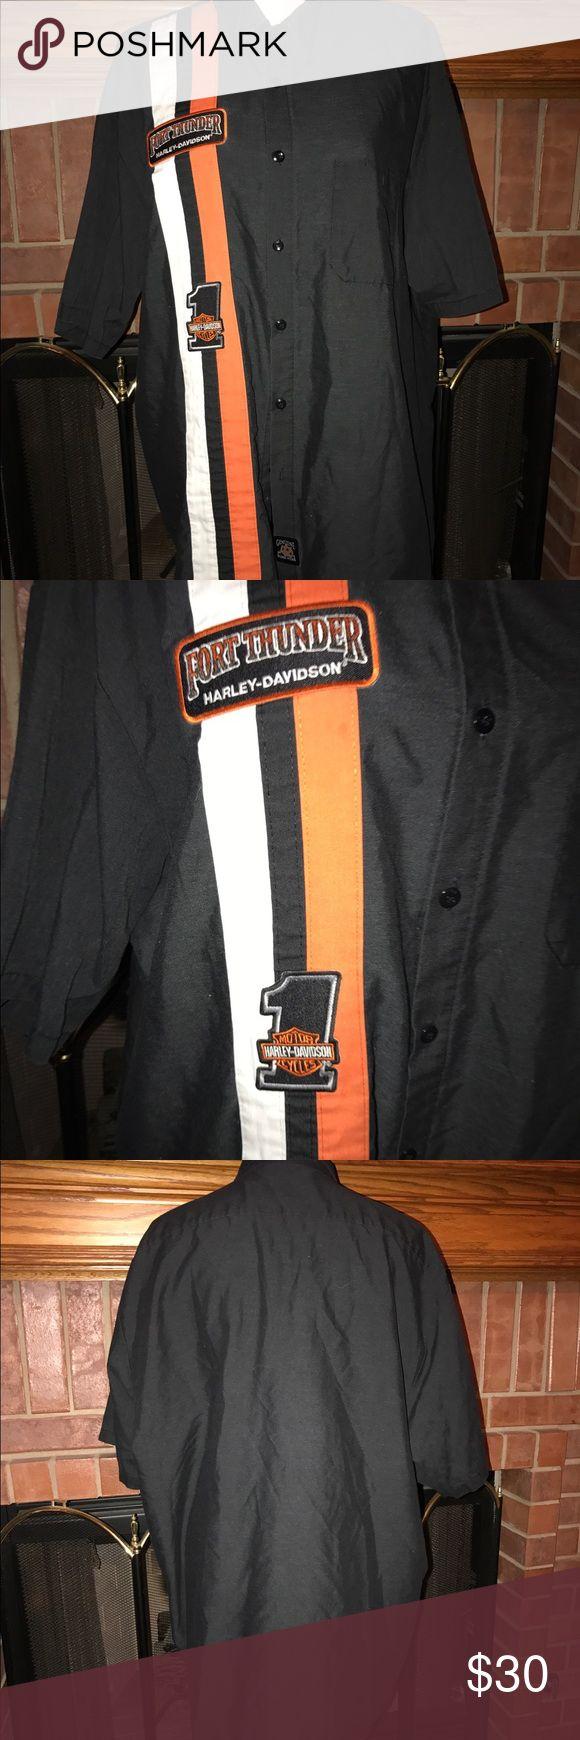 Men's Harley Davidson shop shirt Fort Thunder Harley Davidson shop shirt. 65% polyester, 35% cotton. Size 2XL. NO TRADES! #94 Harley-Davidson Shirts Tees - Short Sleeve